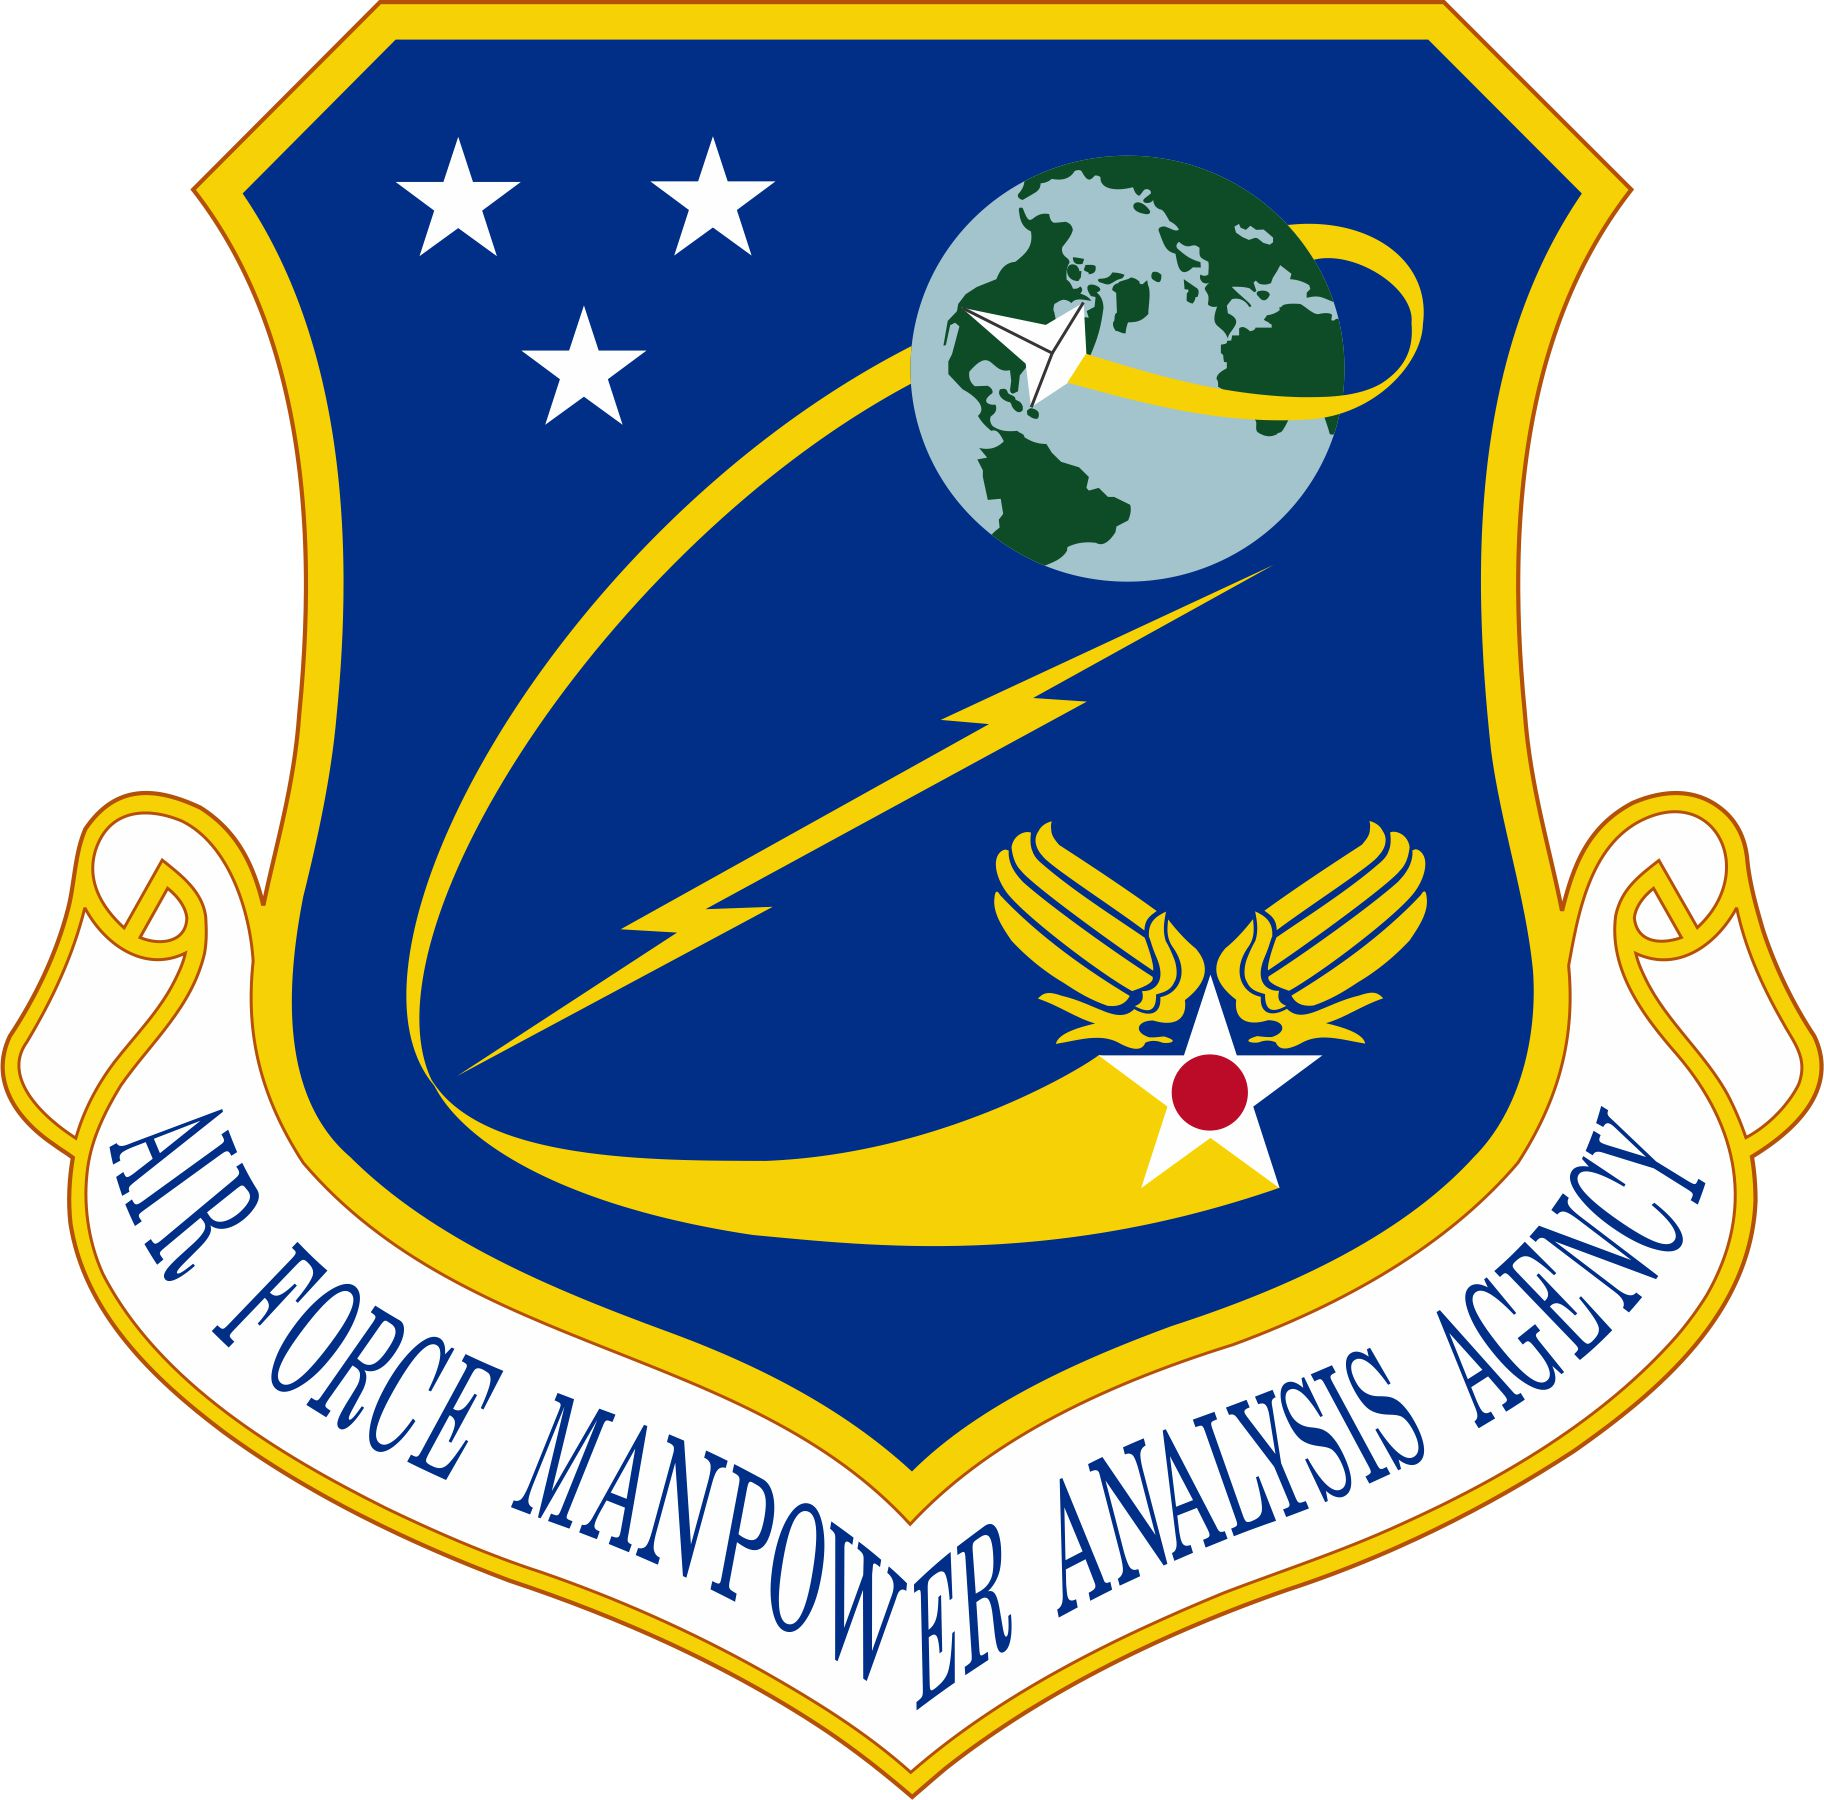 Air Force Manpower Analysis Agency > U.S. Air Force > Fact.